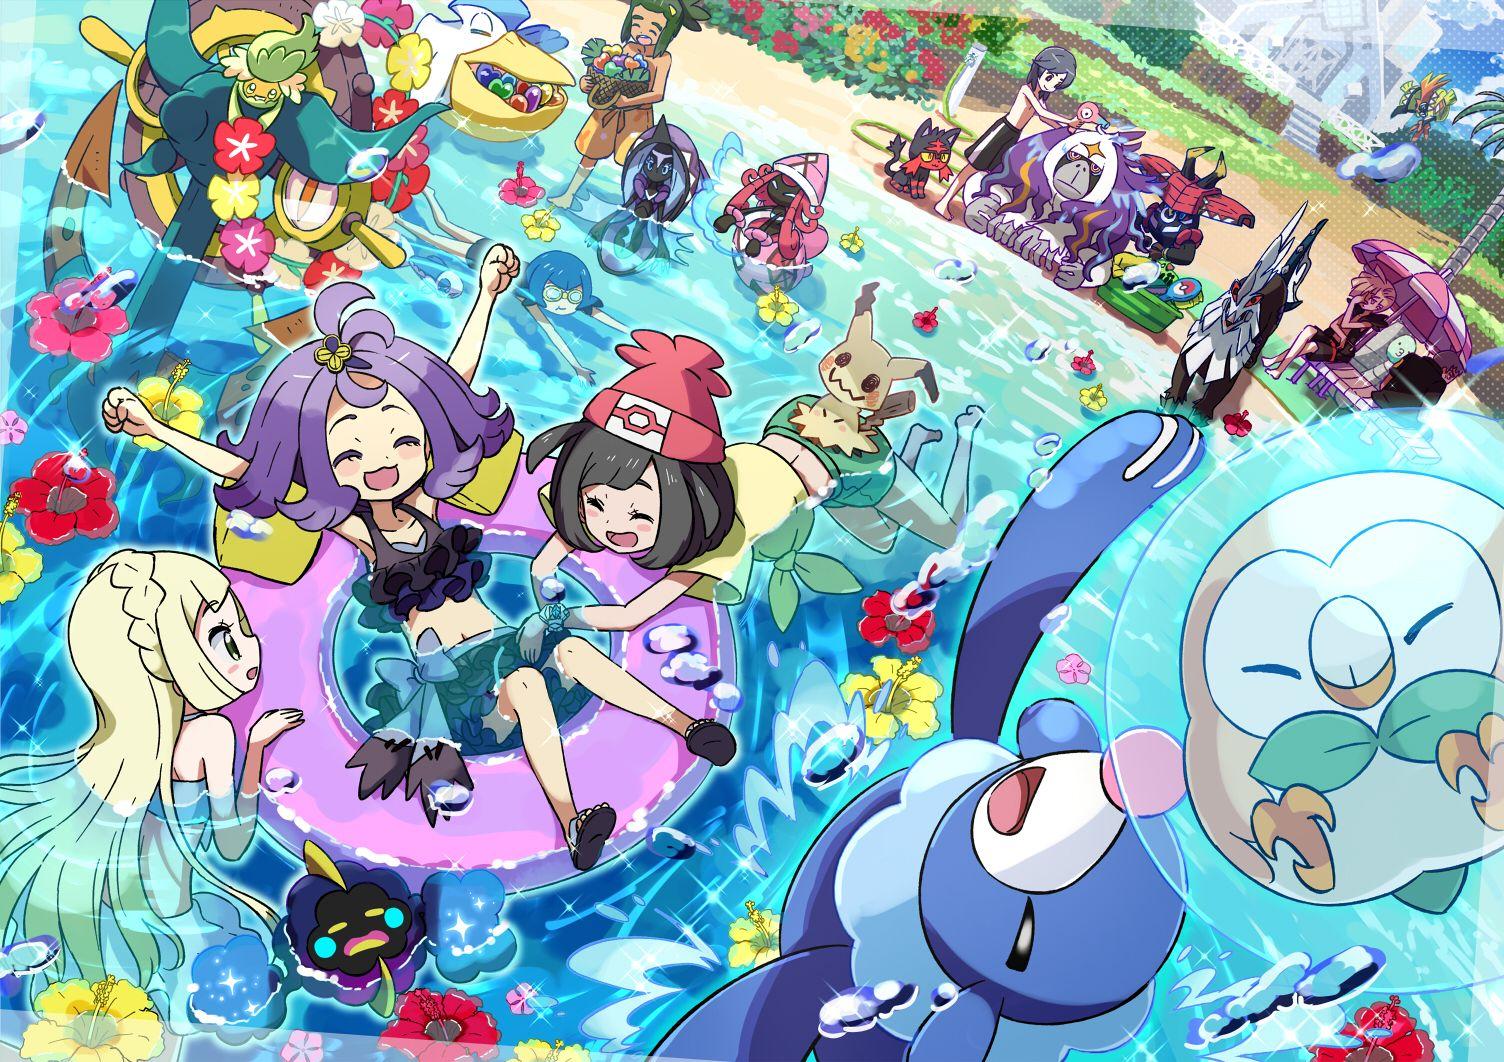 pok c3 a9mon sun moon full 2094568 jpg game pokémon gotta